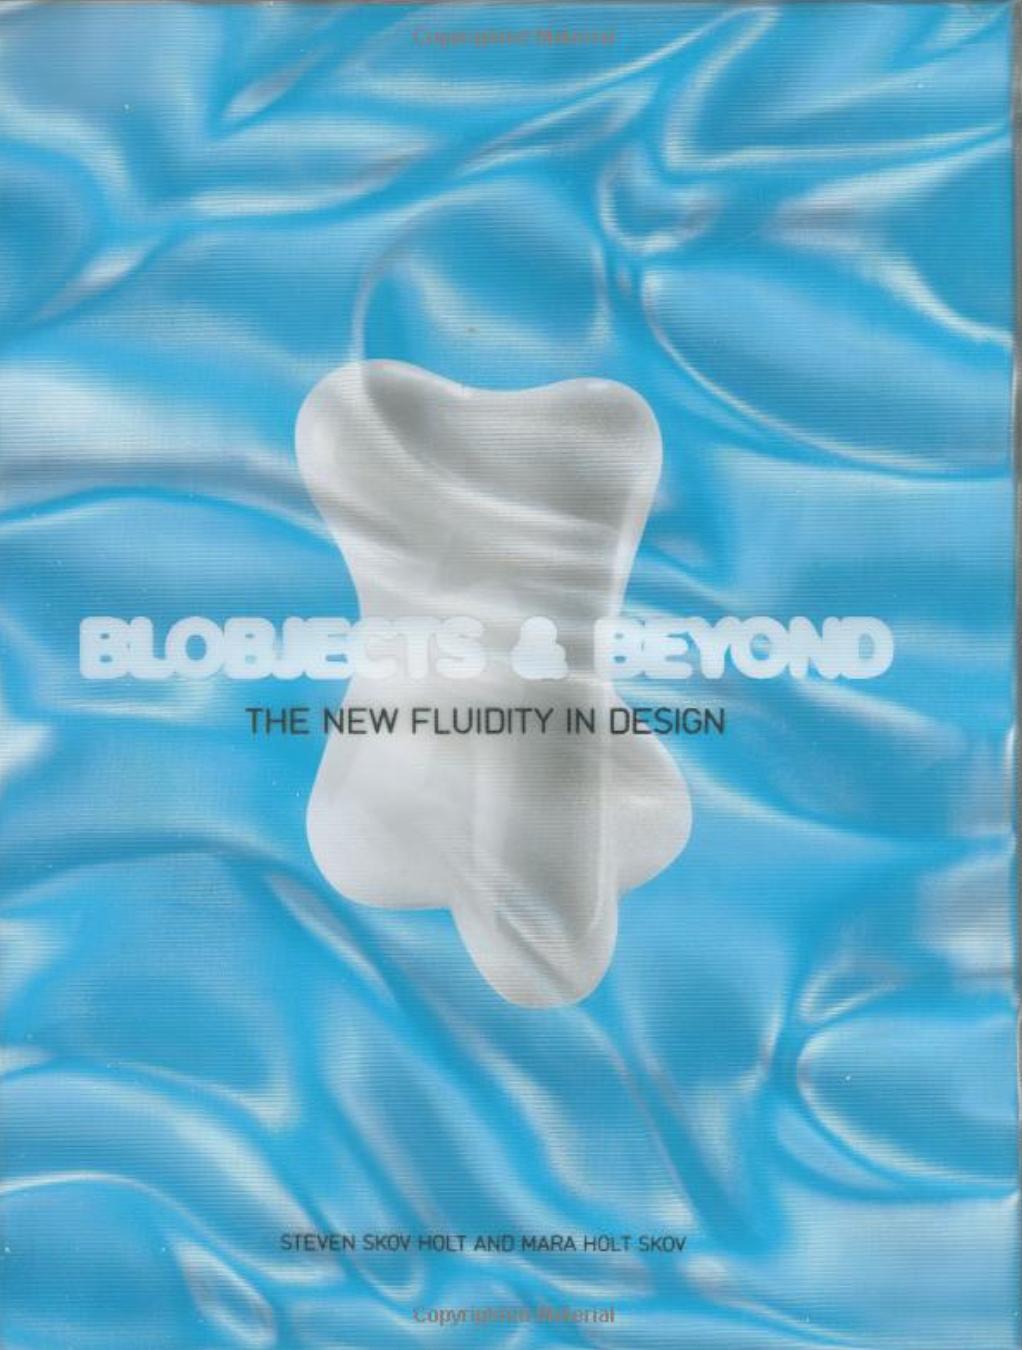 Blobjects & Beyond